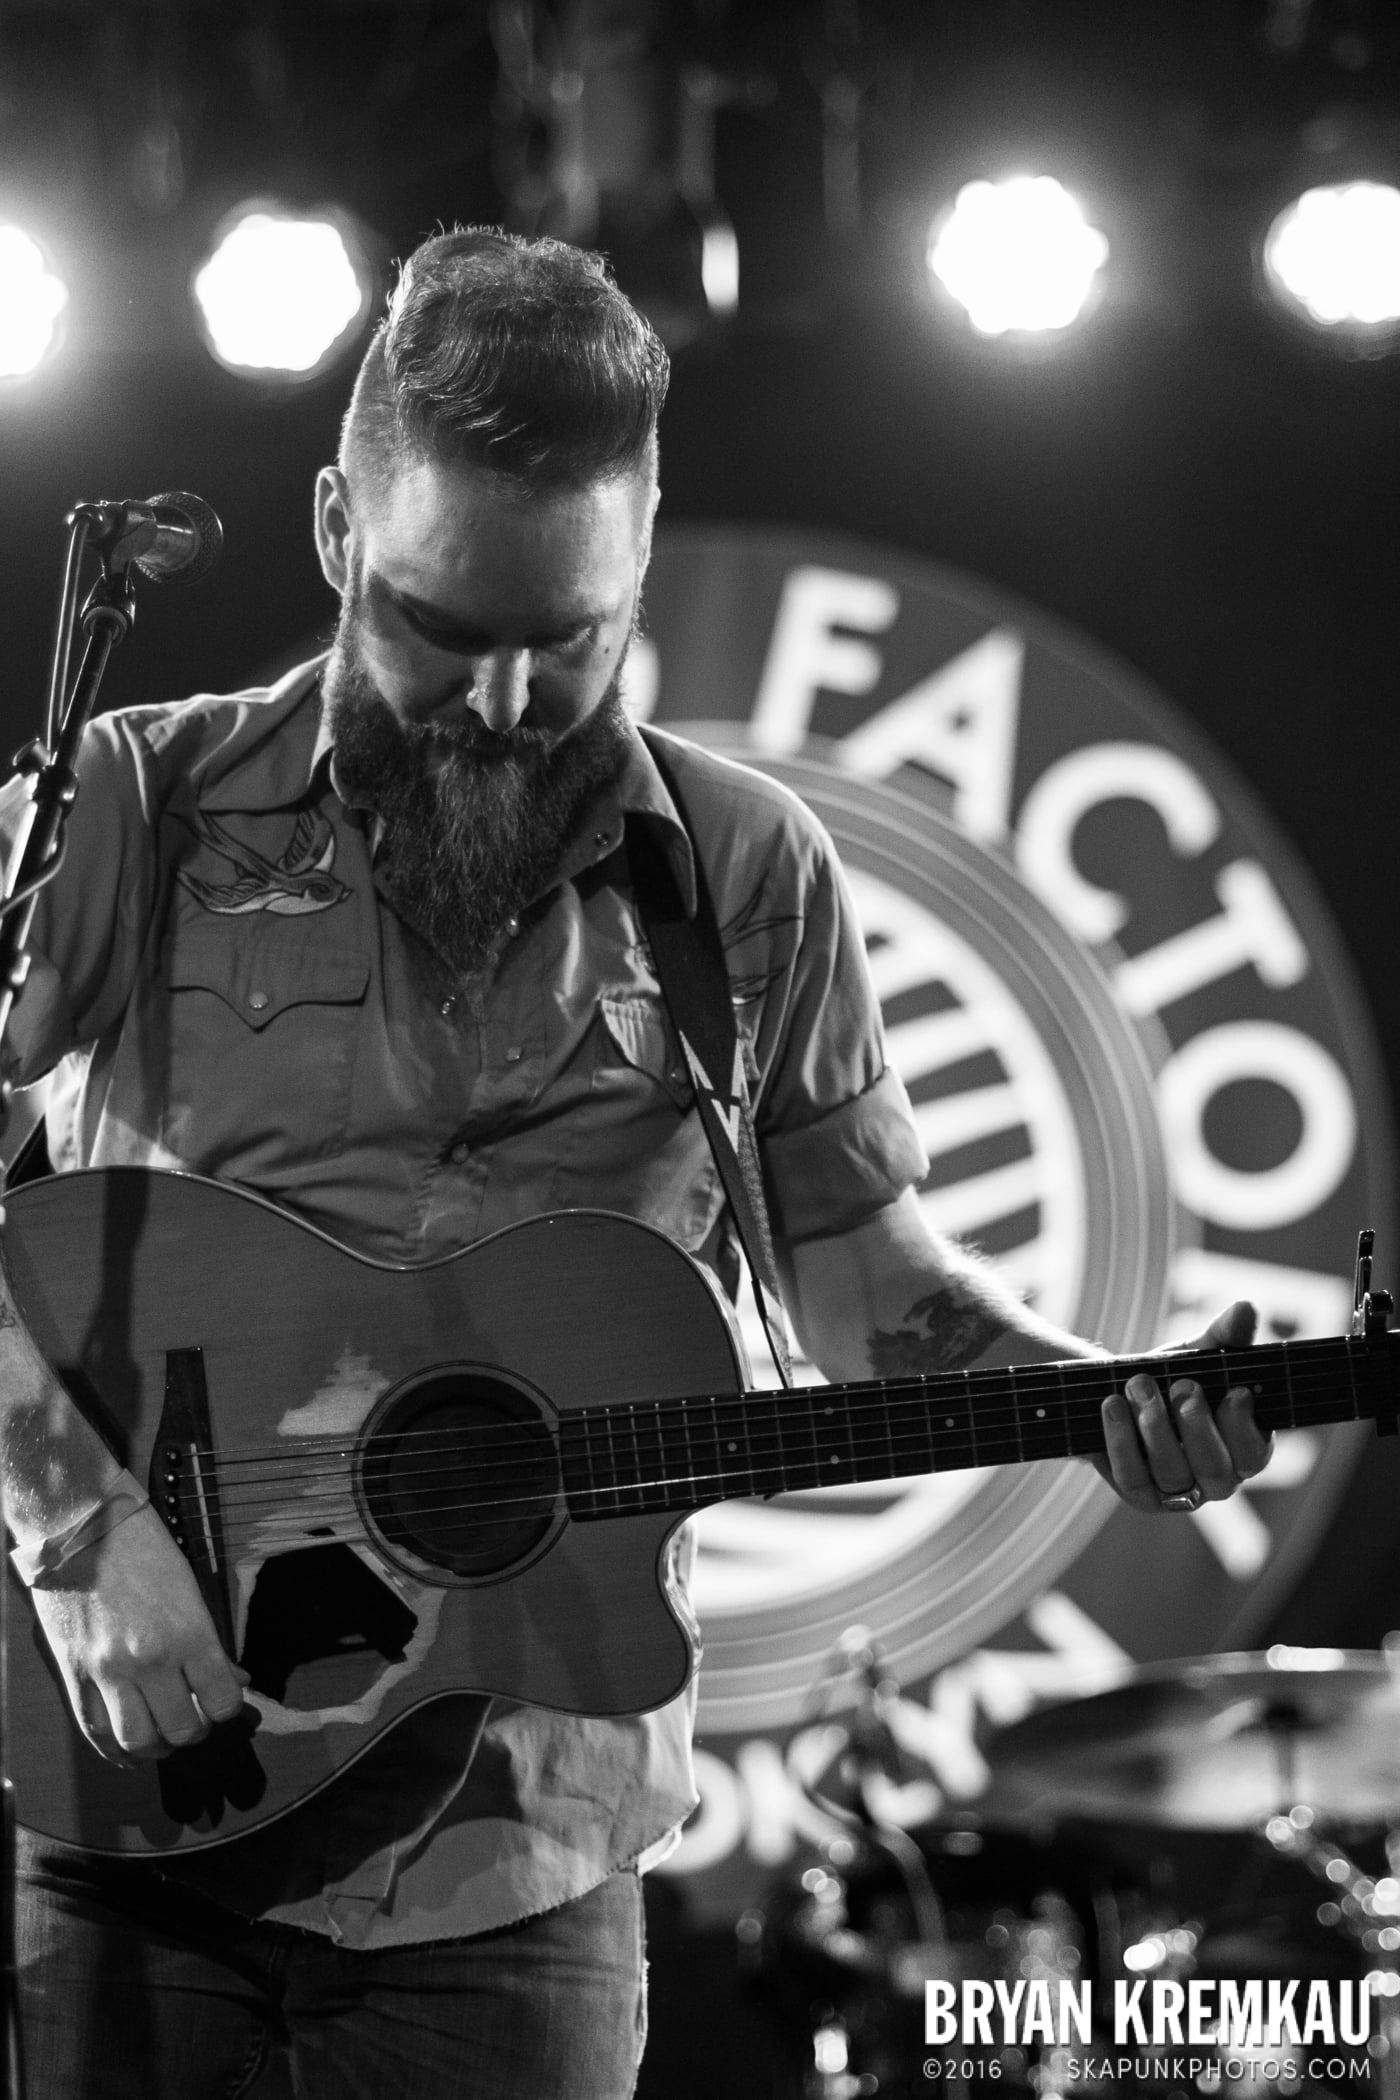 Danny Burns Band @ Knitting Factory, Brooklyn, NY - 9.10.14 (17)